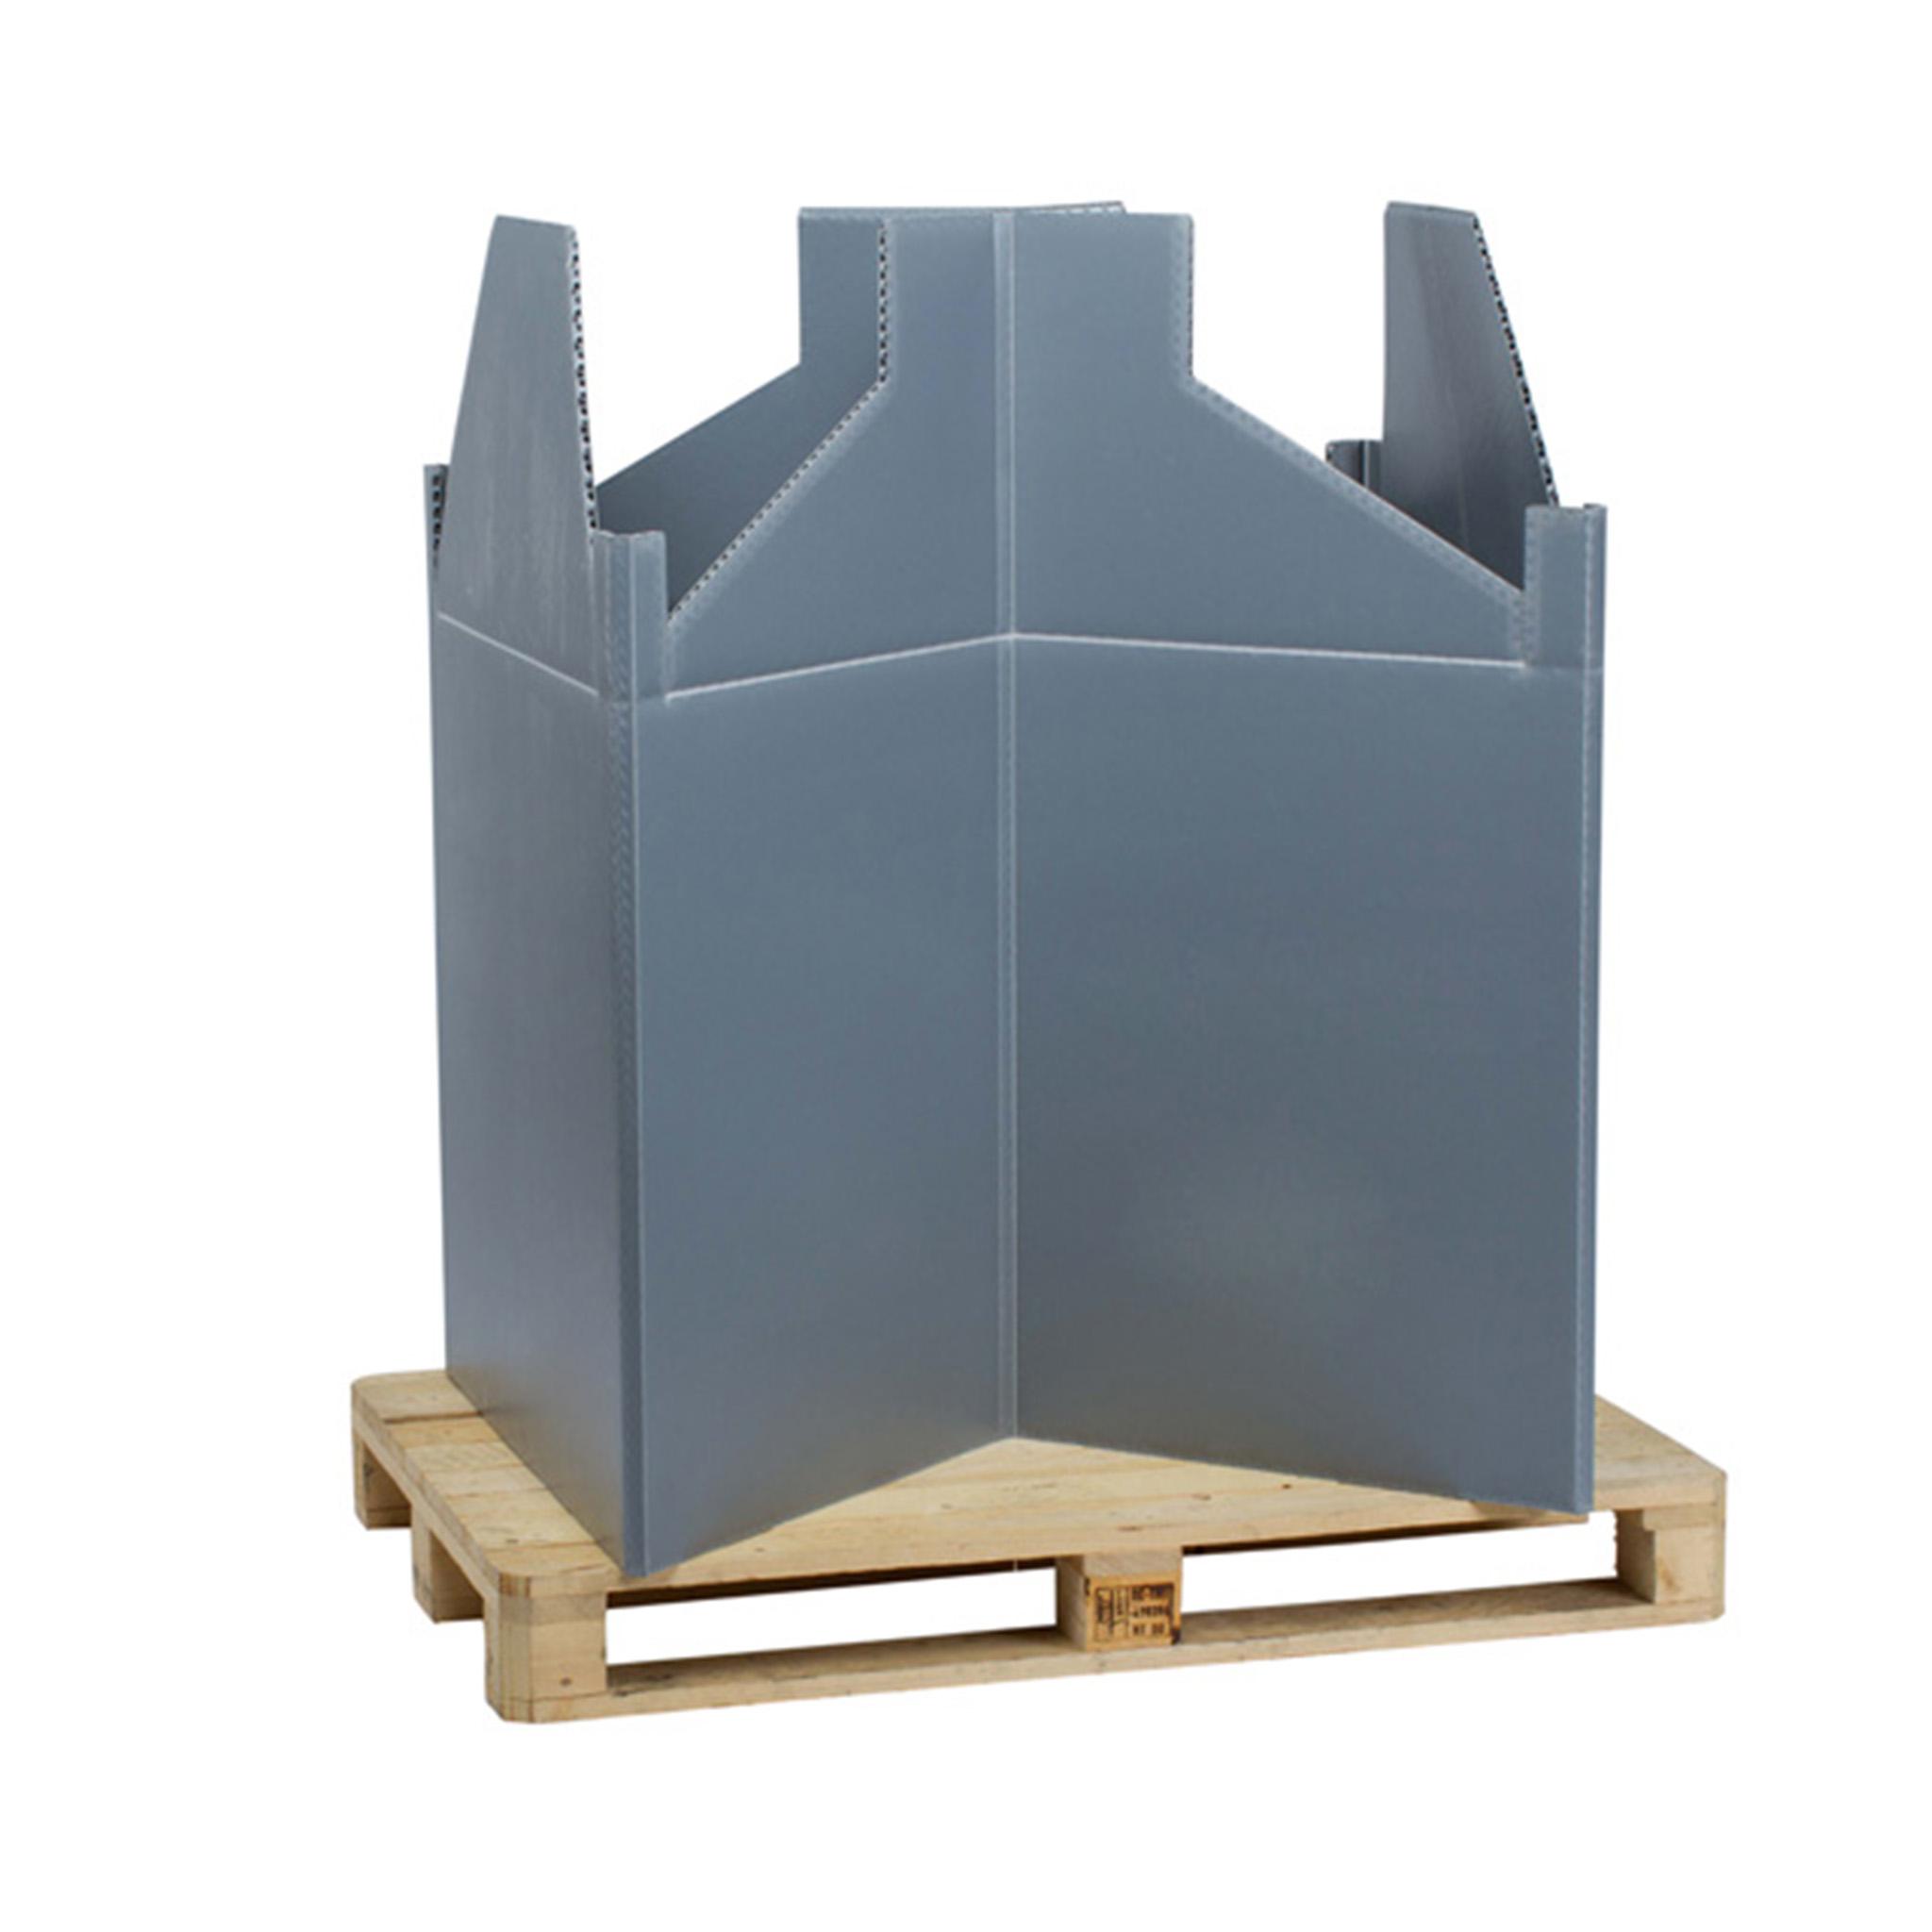 PALLET TOP BOX™